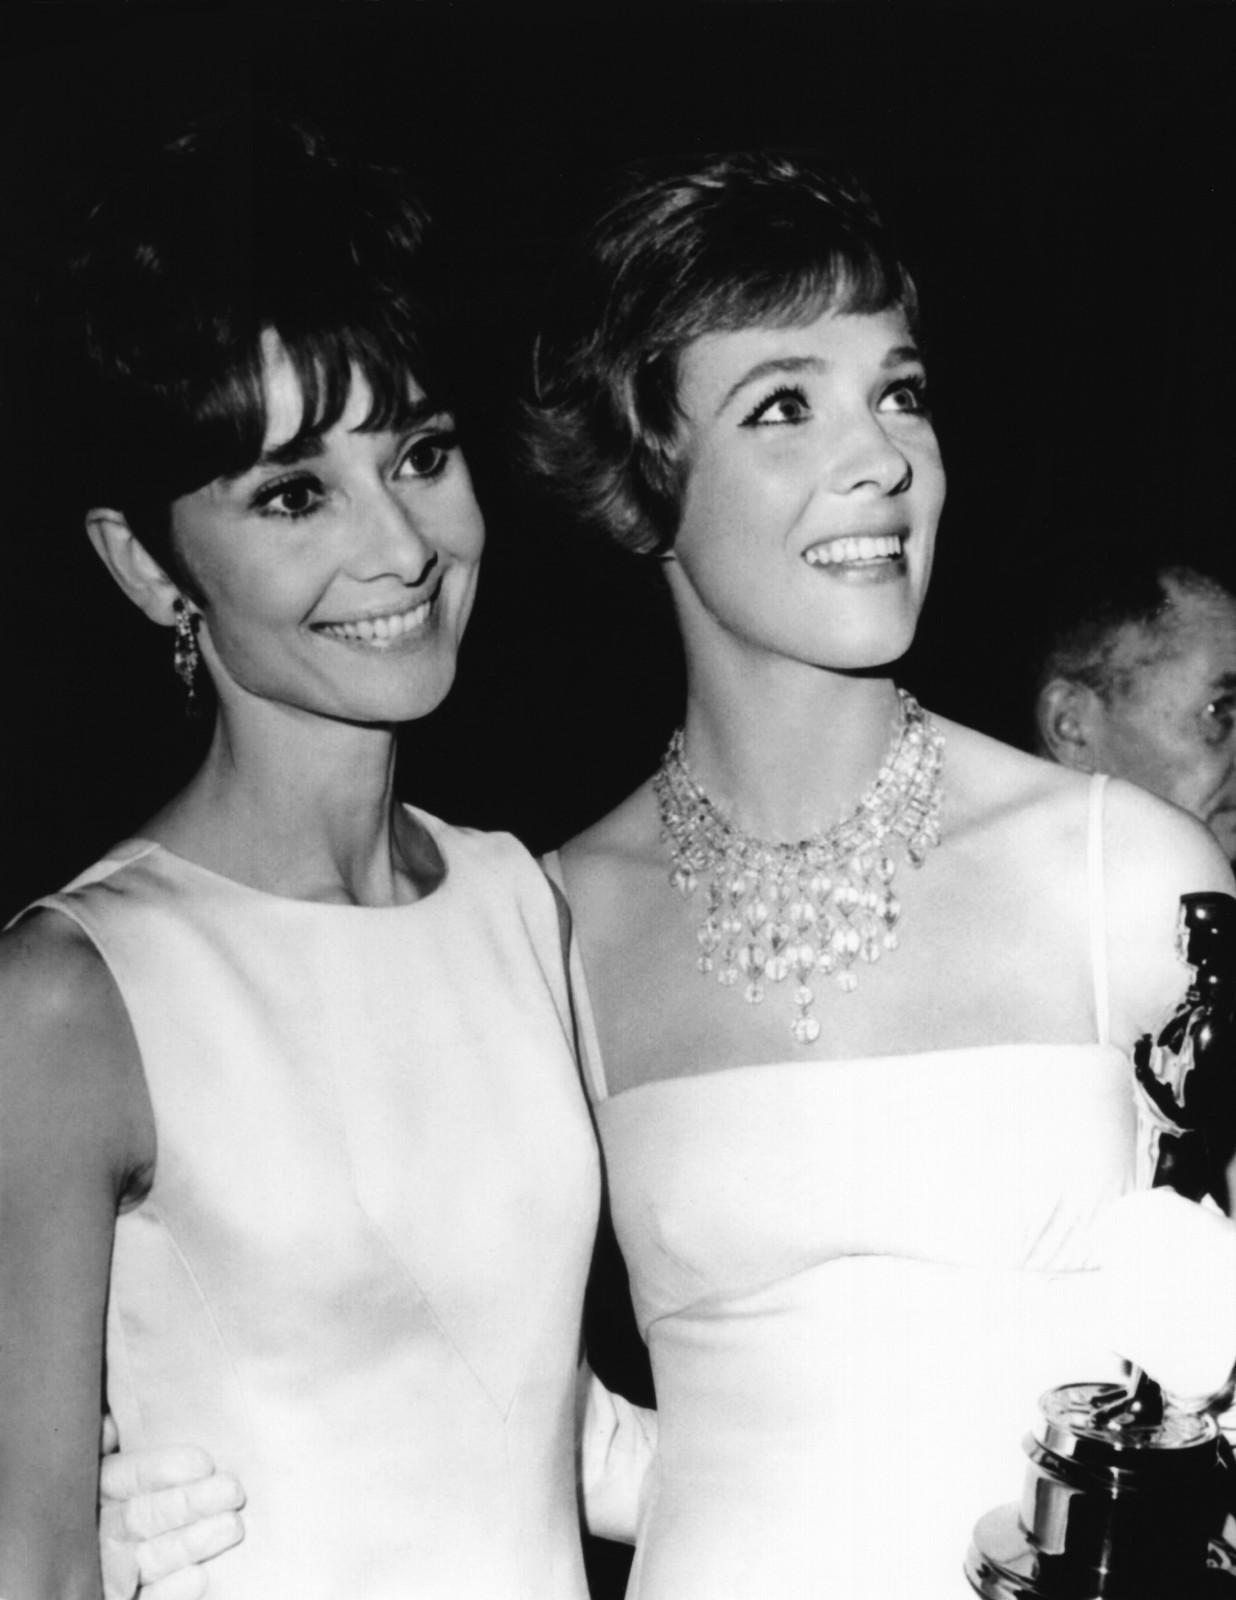 whenthereisfire: screengoddess: Audrey Hepburn & Julie Andrews1965 Julie Andrews is my God.